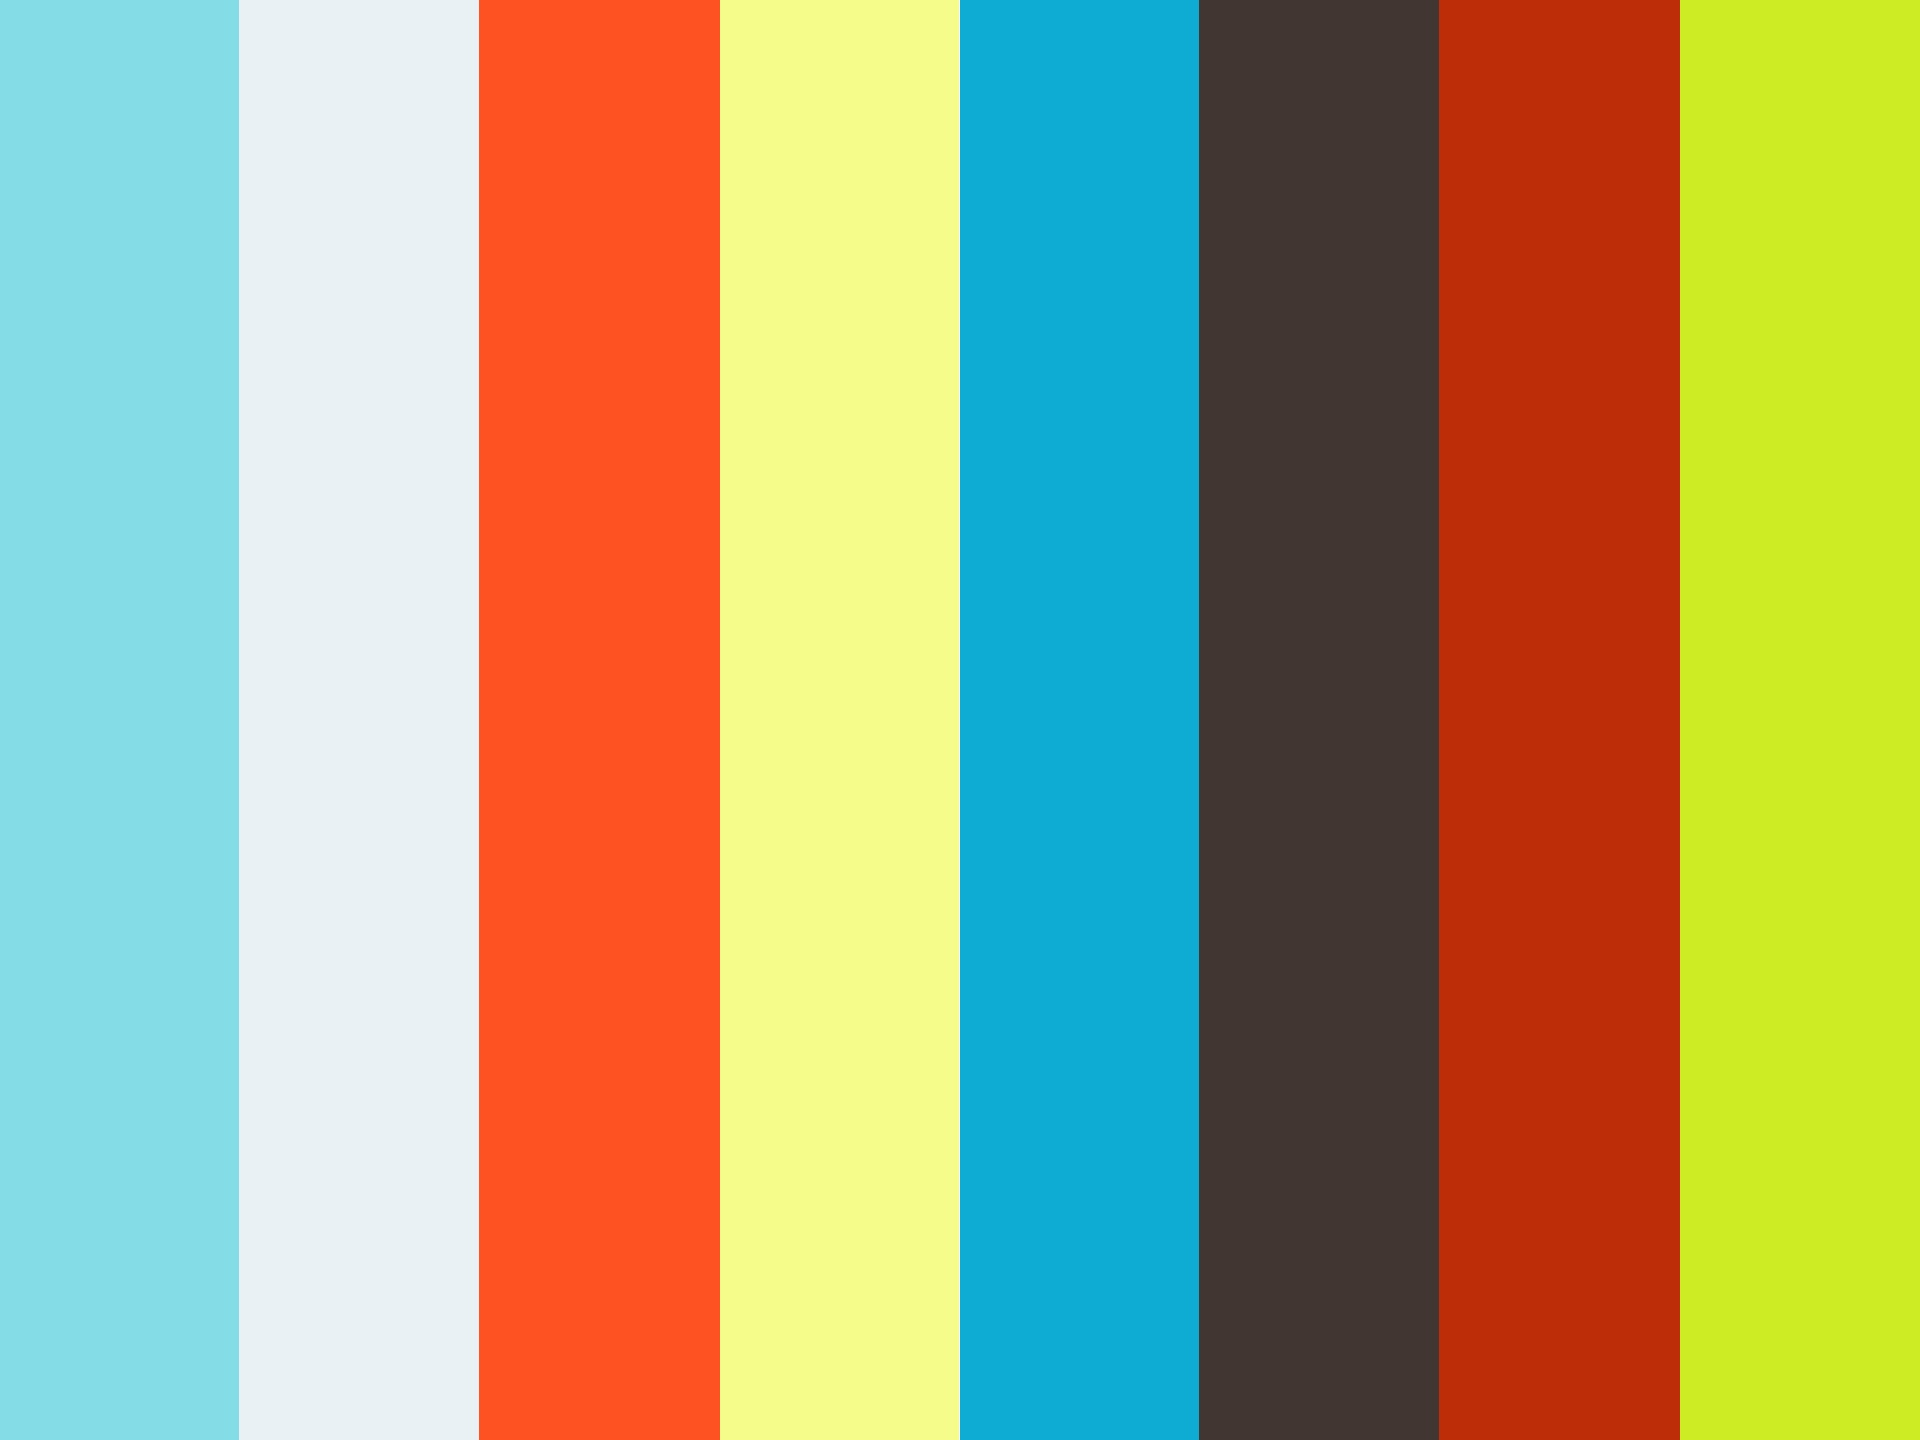 Watch Sofa Ski School   Combo: Blue To Black + Blue To Powder Online |  Vimeo On Demand On Vimeo